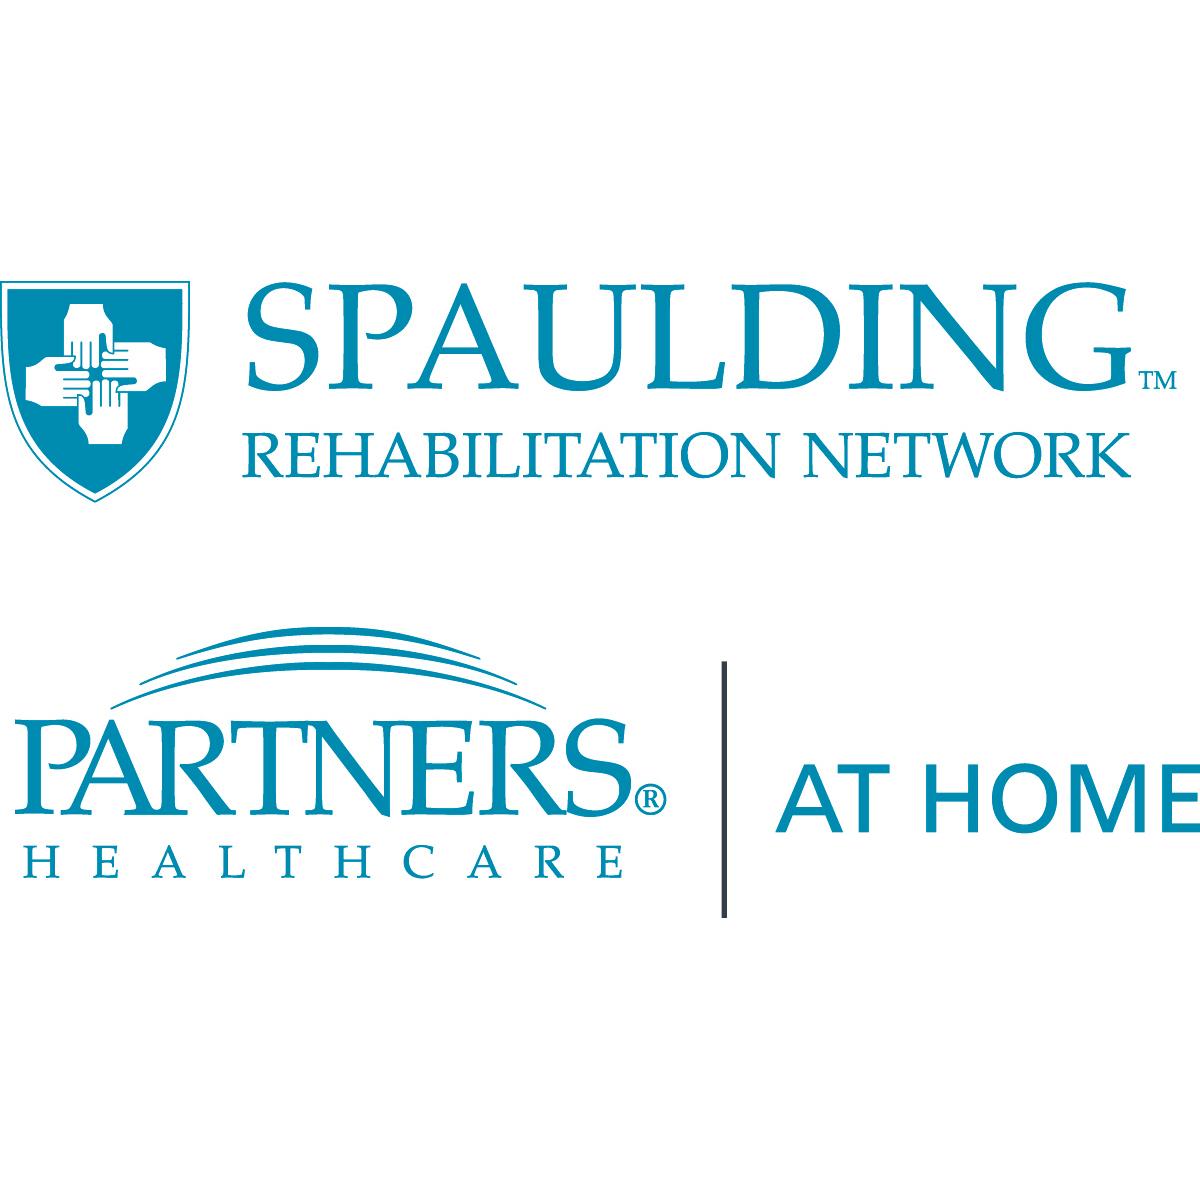 Spaulding Rehab/Partner Healthcare